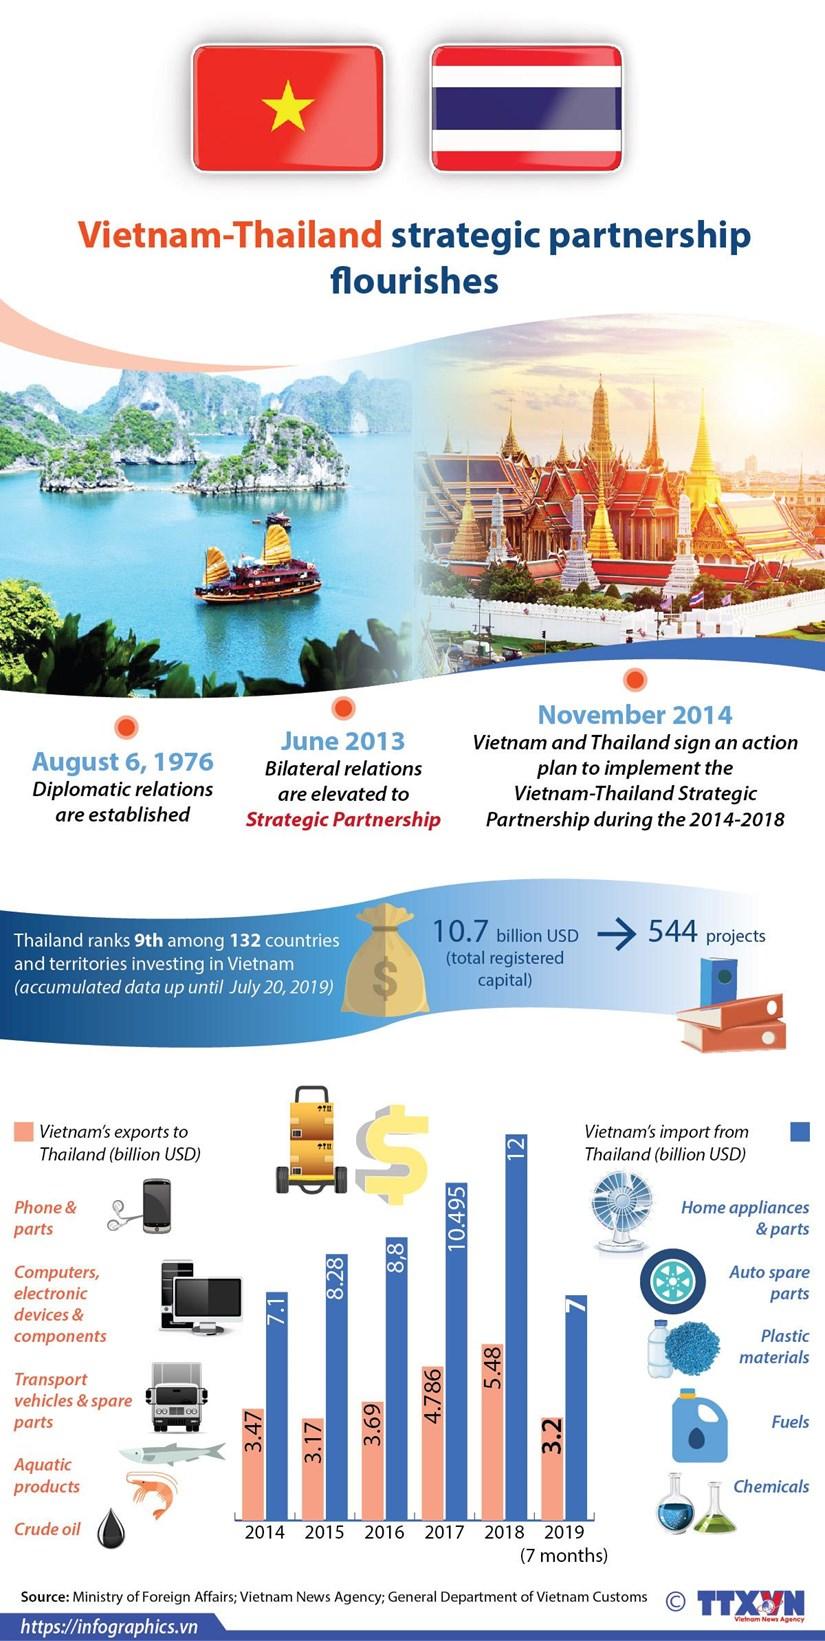 Vietnam-Thailand strategic partnership flourishes hinh anh 1